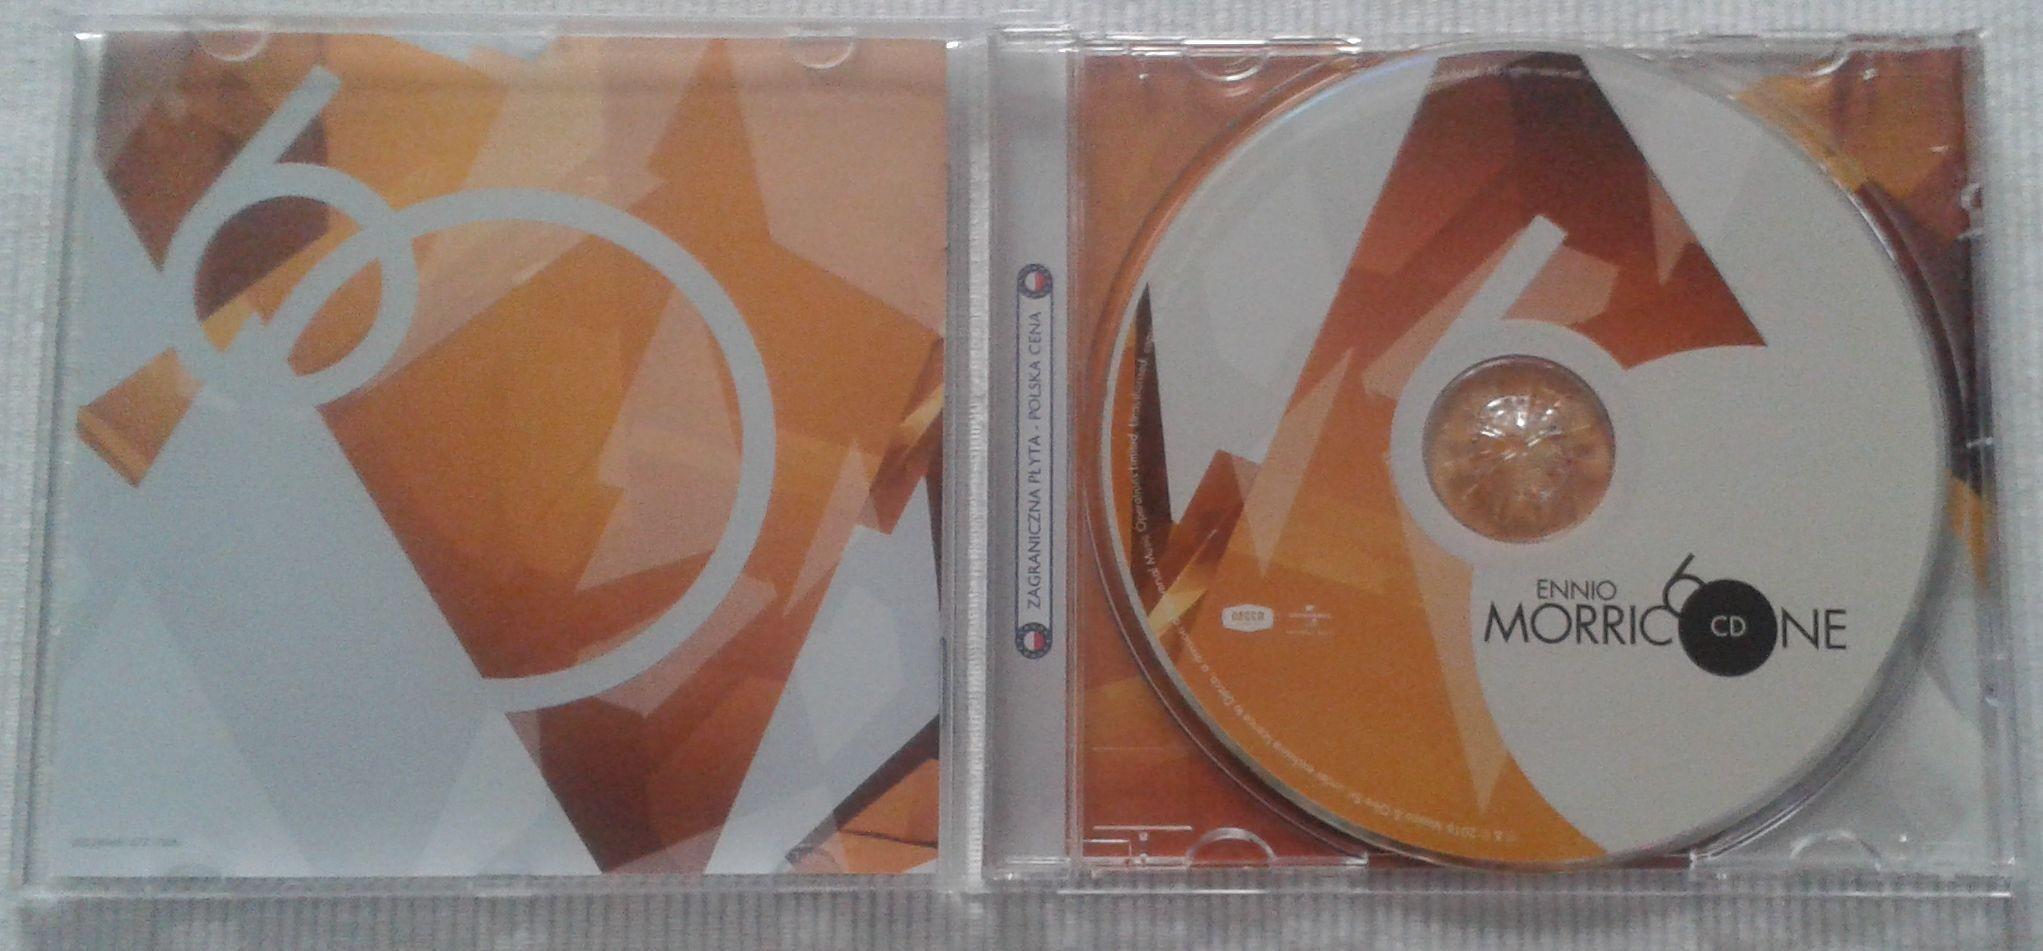 Ennio 60 CD z płytą.jpg